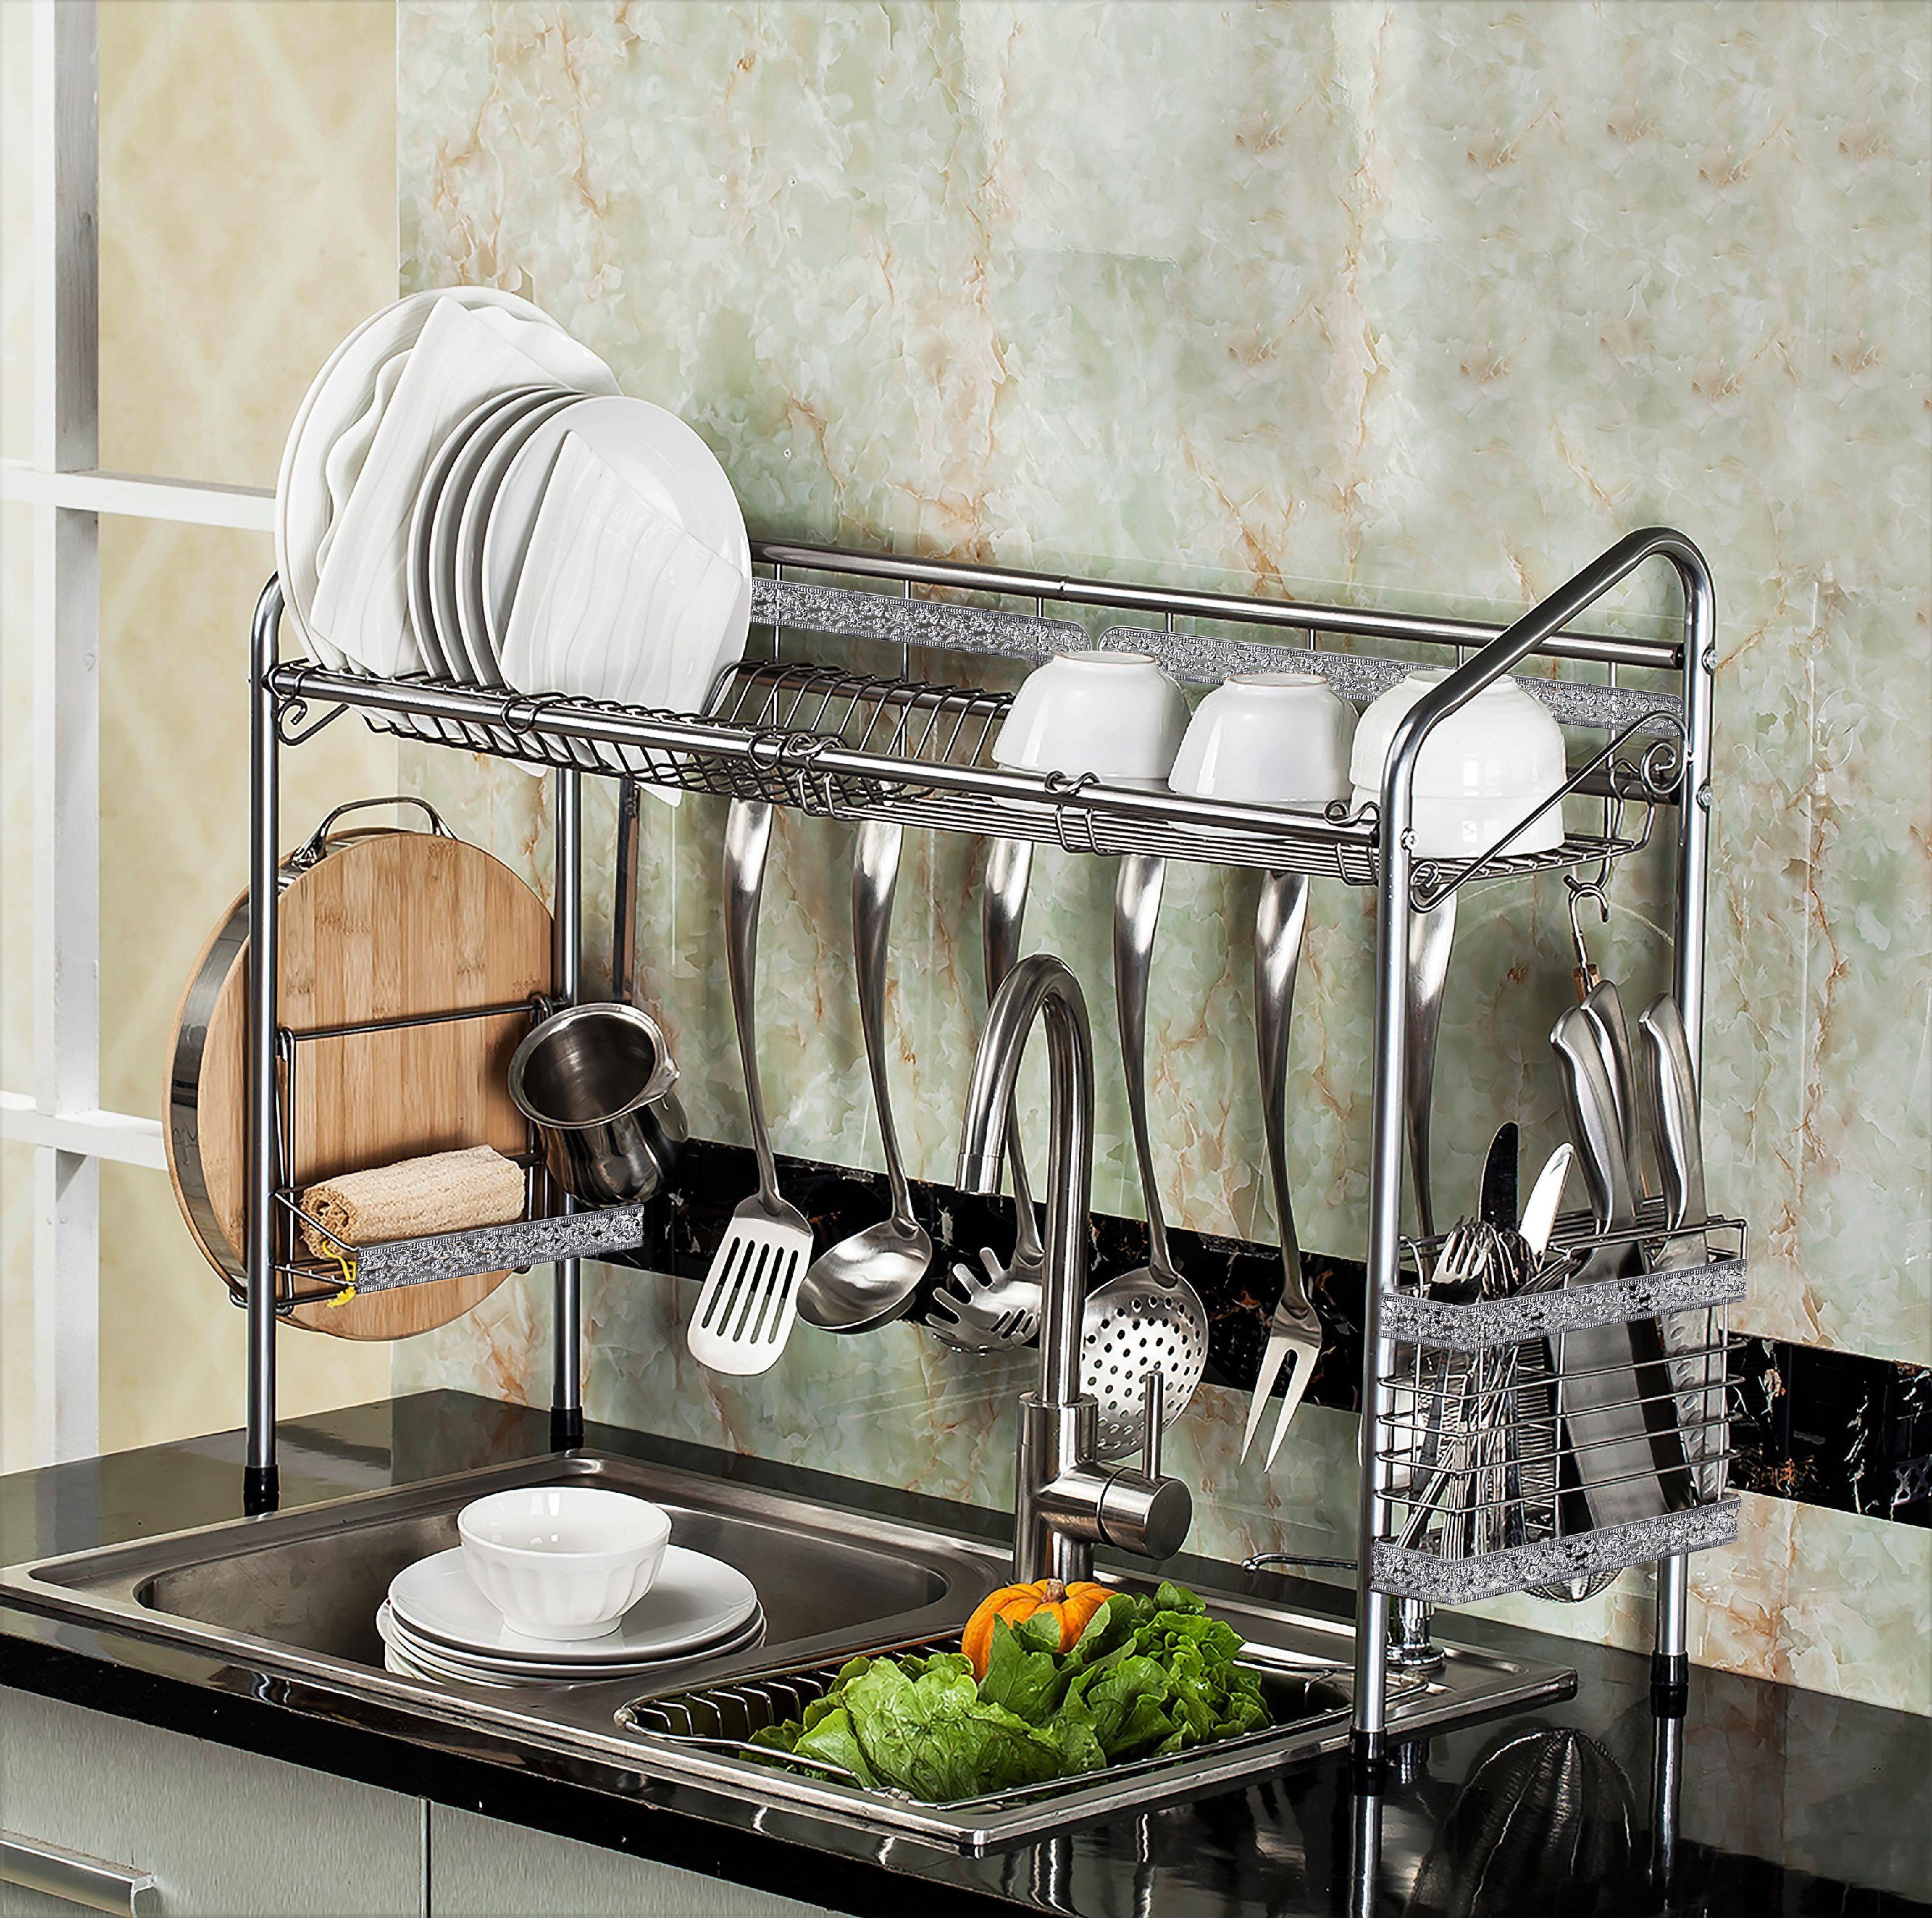 PremiumRacks Professional Over The Sink Dish Rack - Fully Customizable - Multipurpose - Large Capacity - Walmart.com